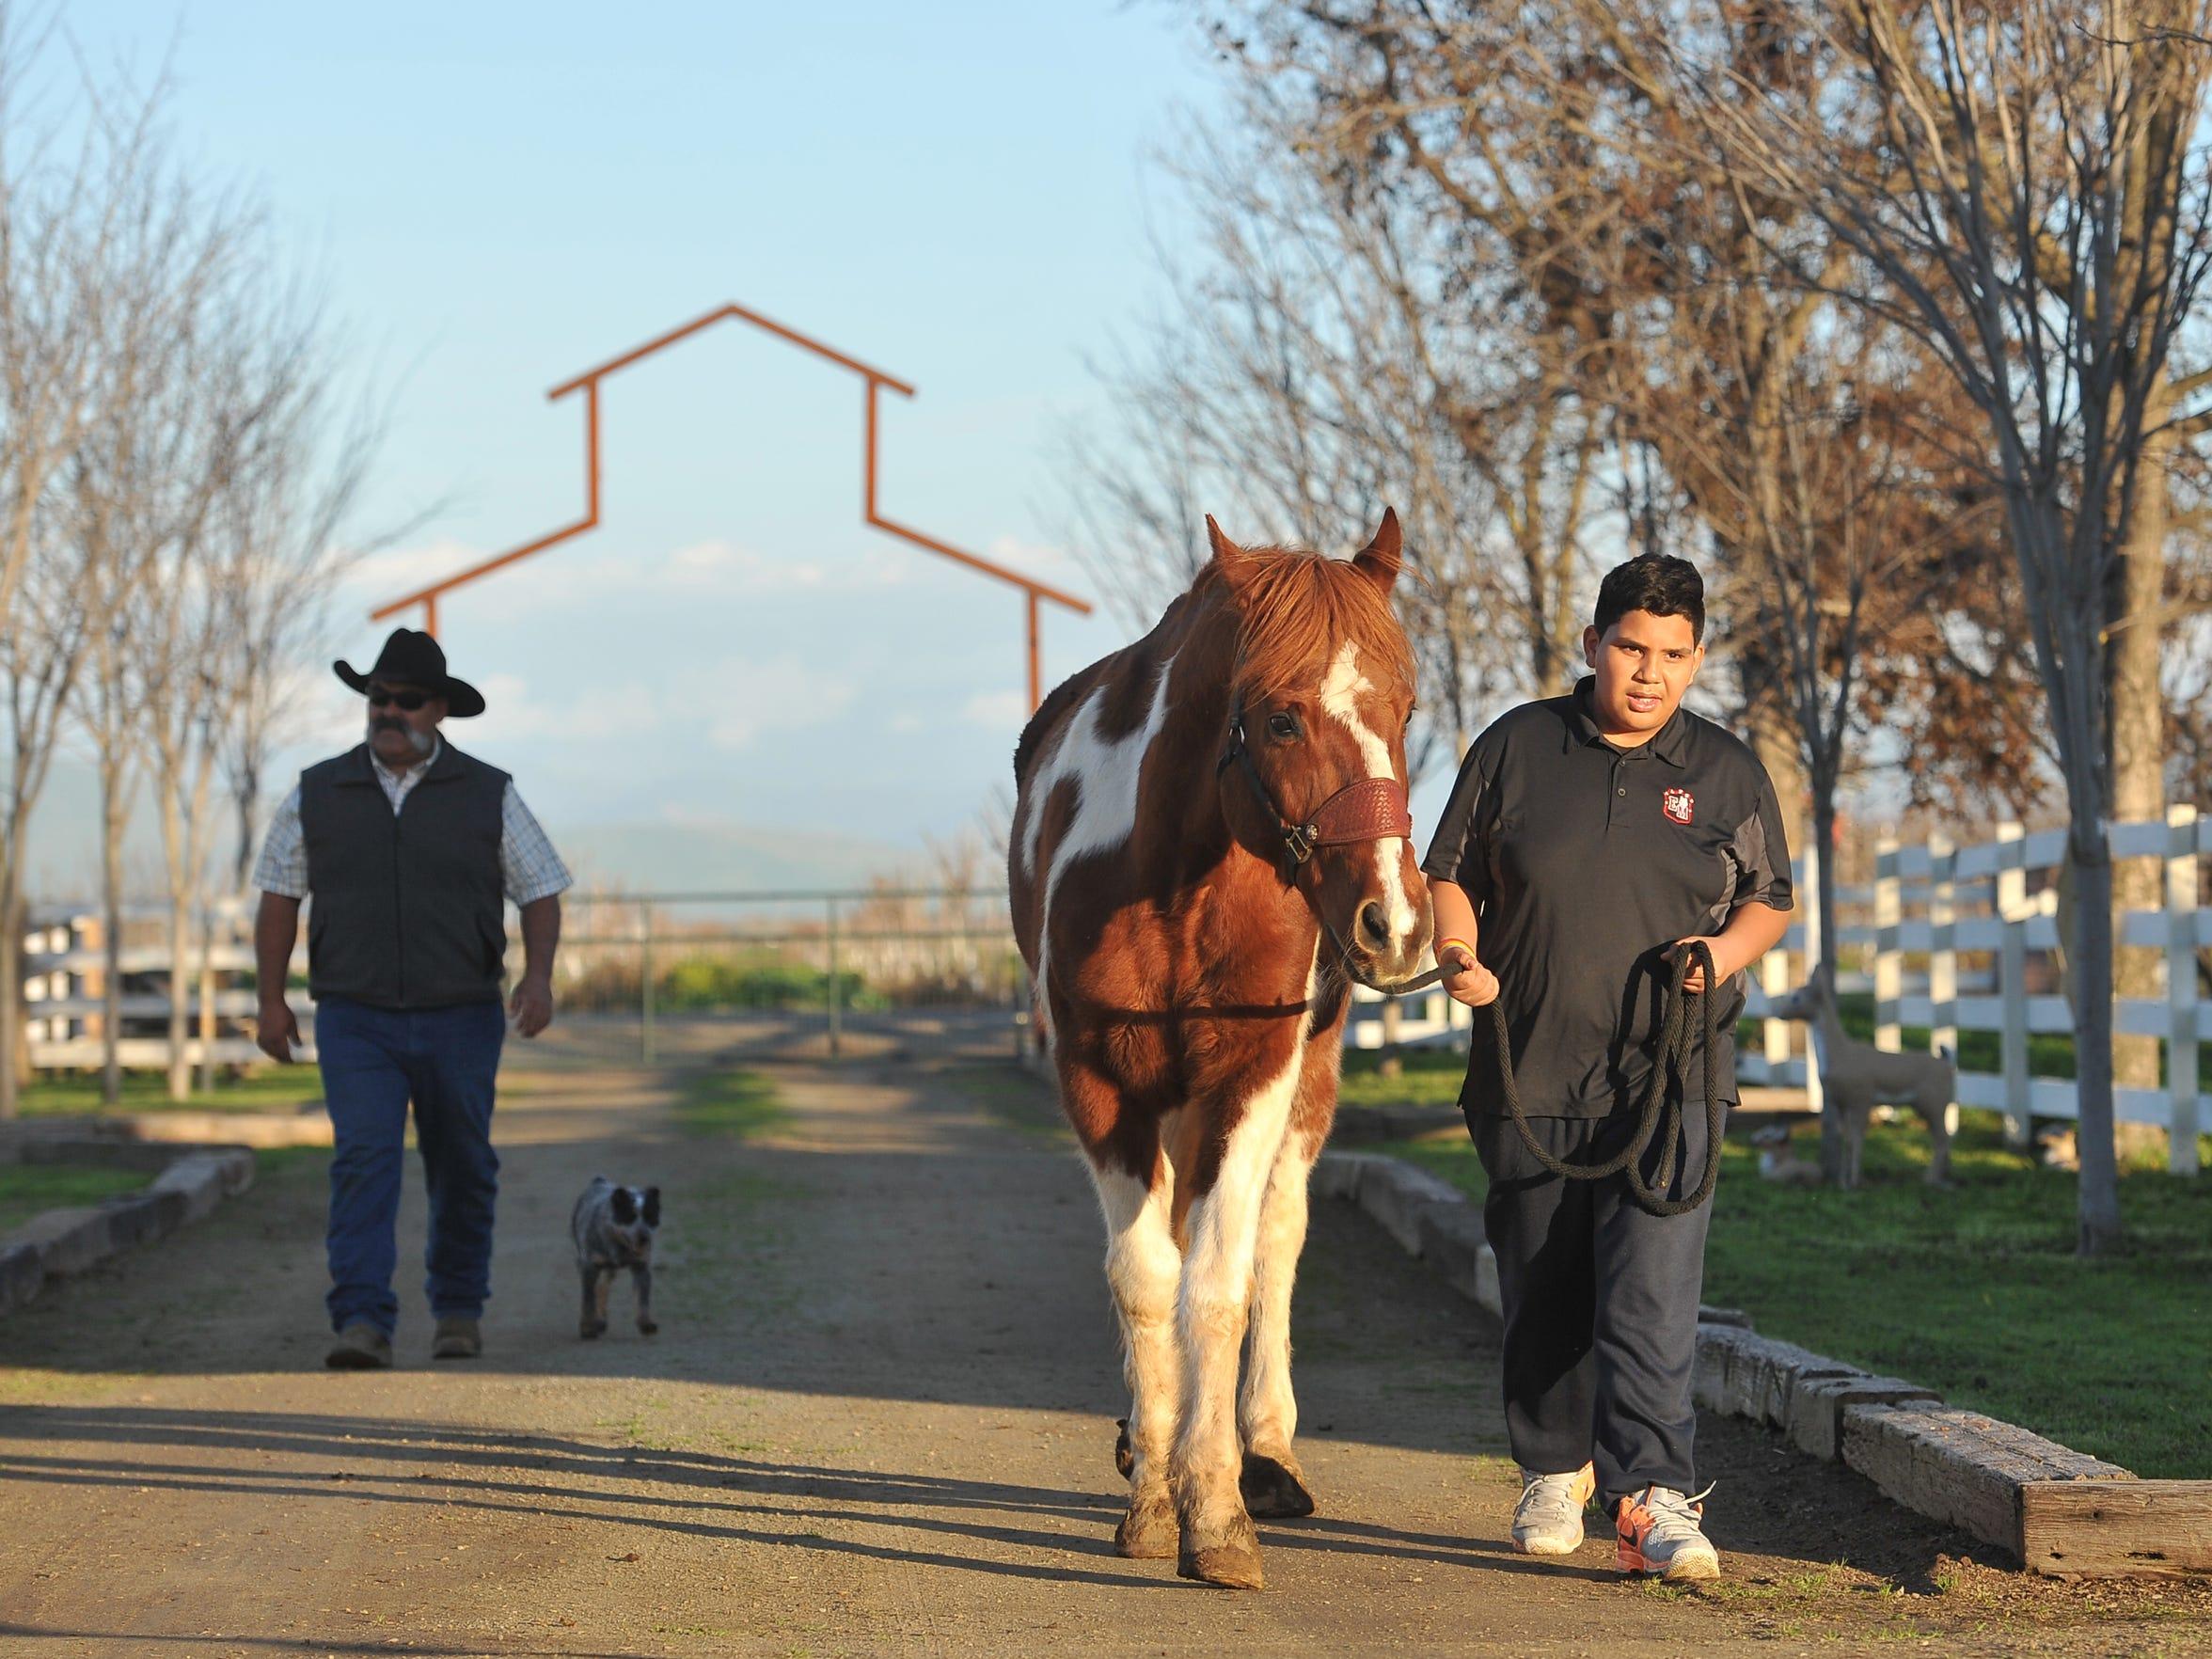 A.L.P.H.A. student Brigido Cruz of El Monte Middle School walks a horse at JM Ranch on Friday, January 15, 2016.